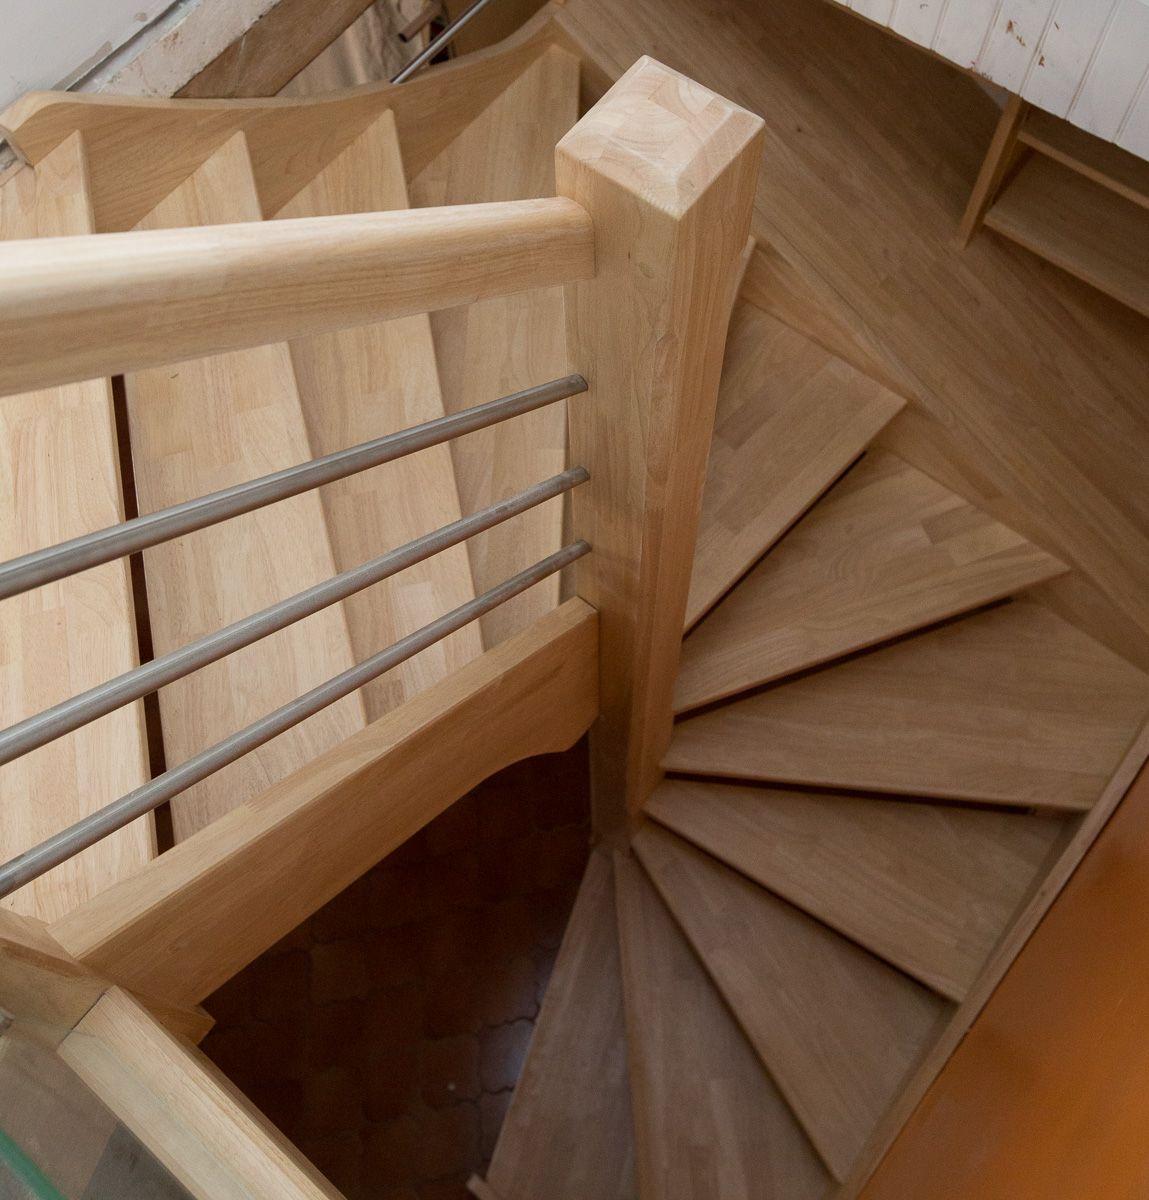 pingl par fox fox sur en 2019 escalier en colima on. Black Bedroom Furniture Sets. Home Design Ideas